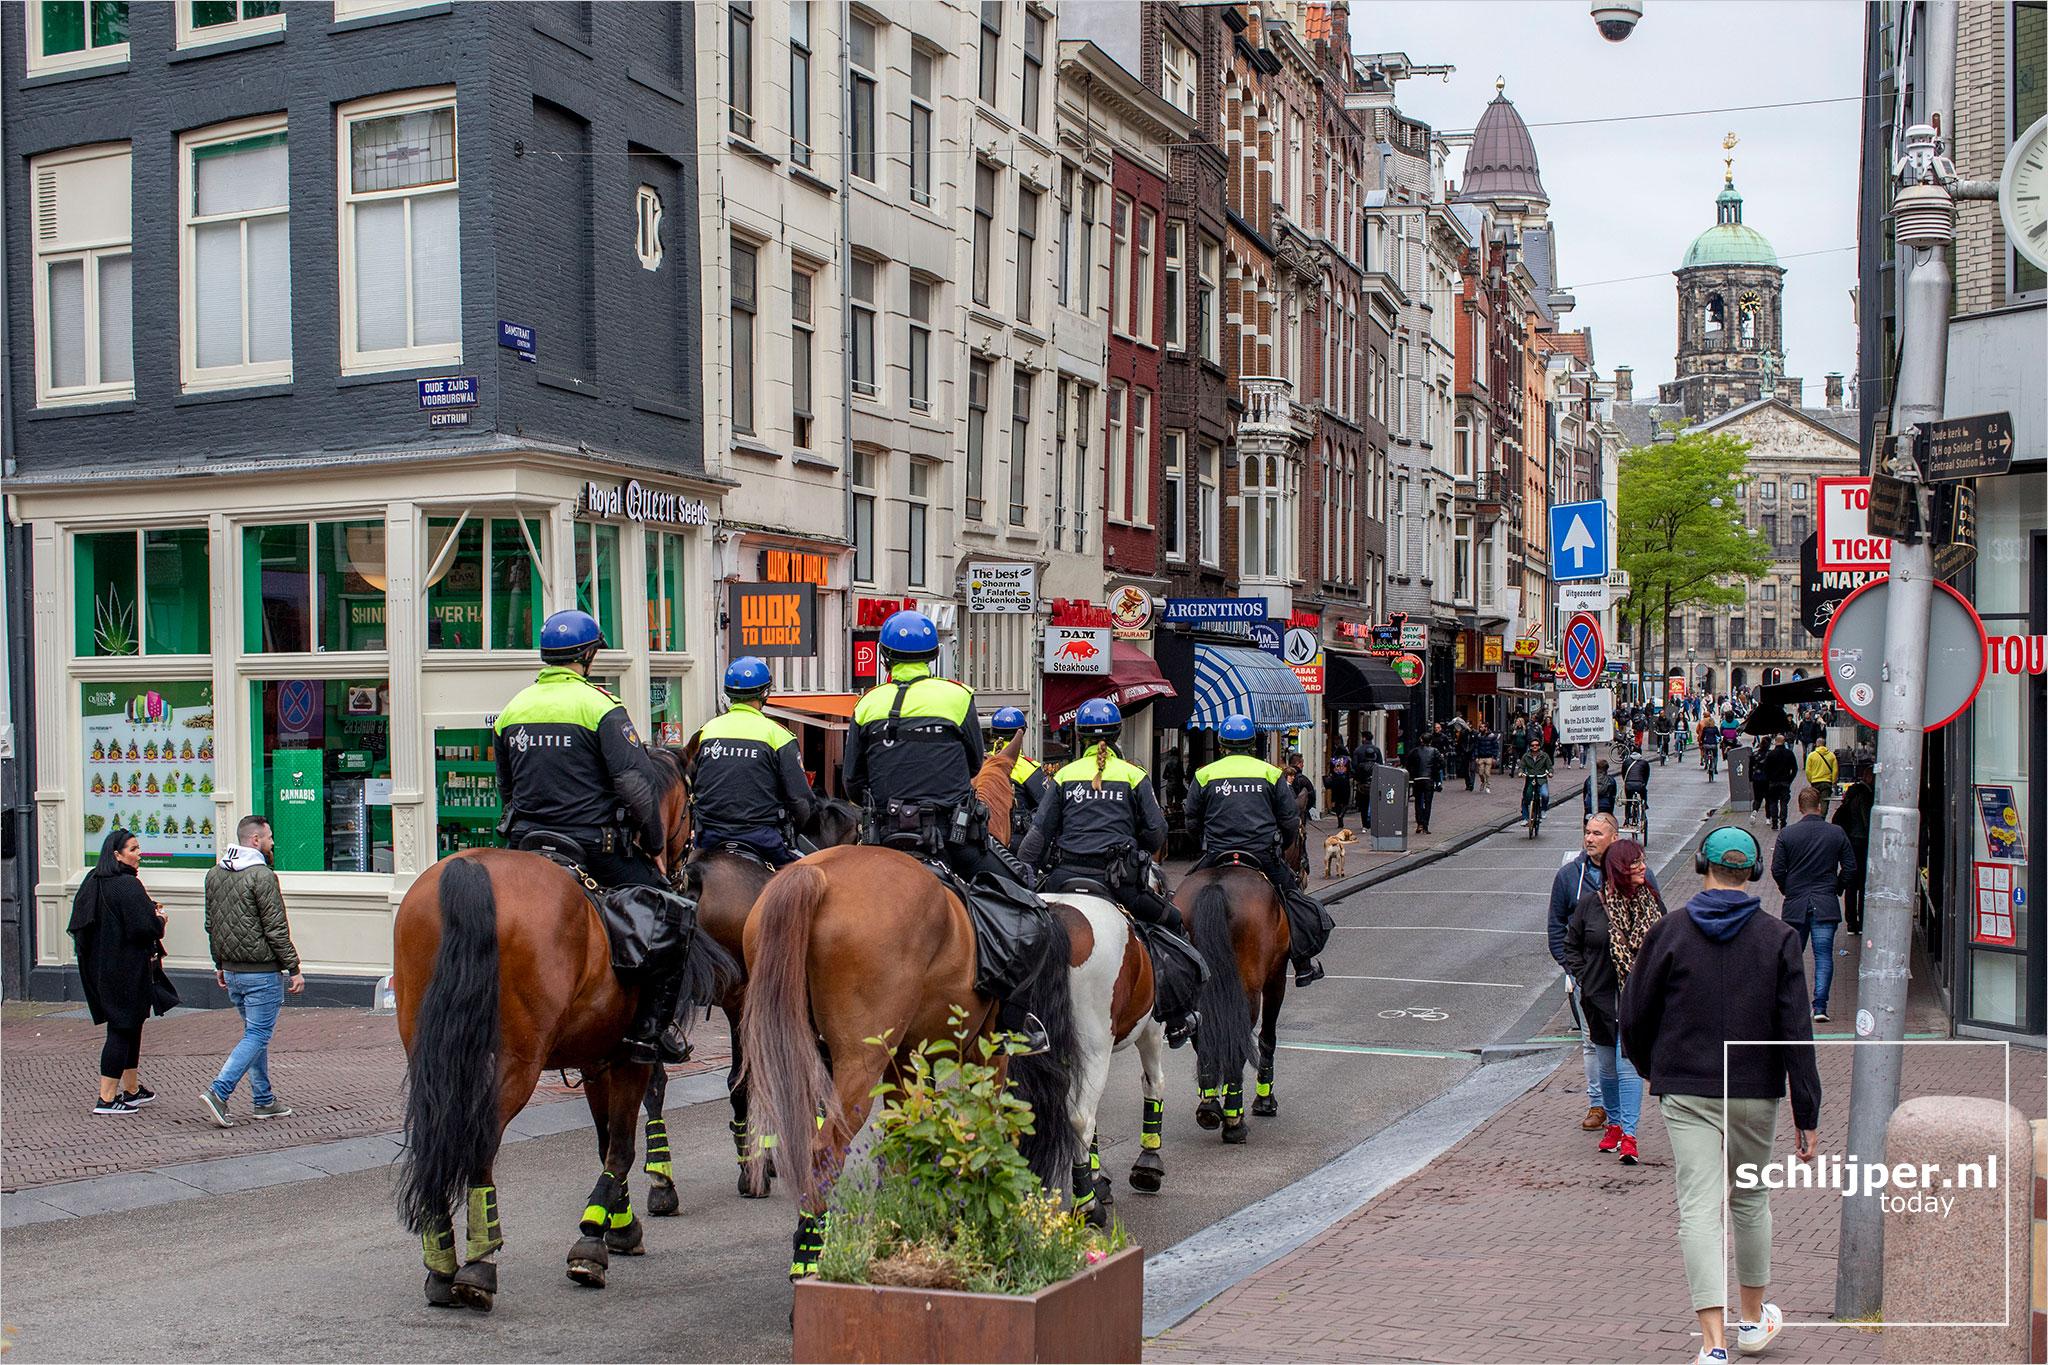 Nederland, Amsterdam, 7 juni 2020